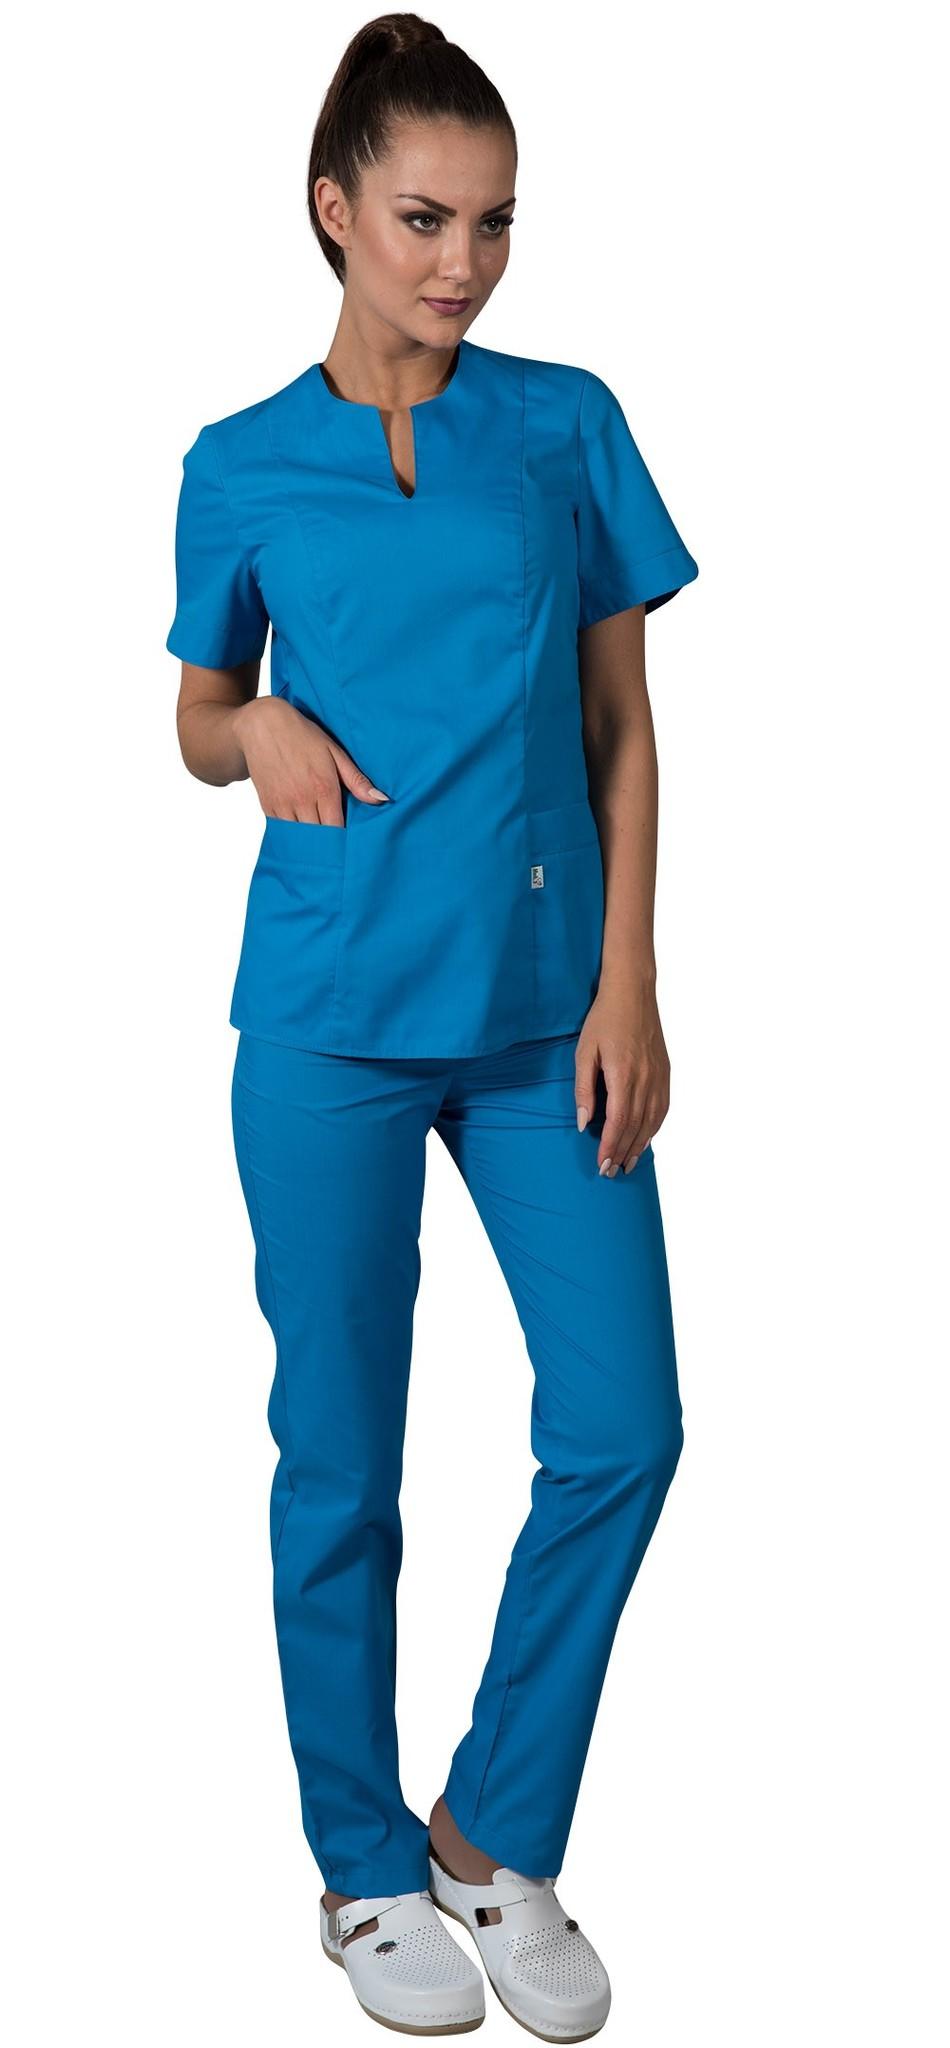 Блуза хирургическая Бл-331 айман